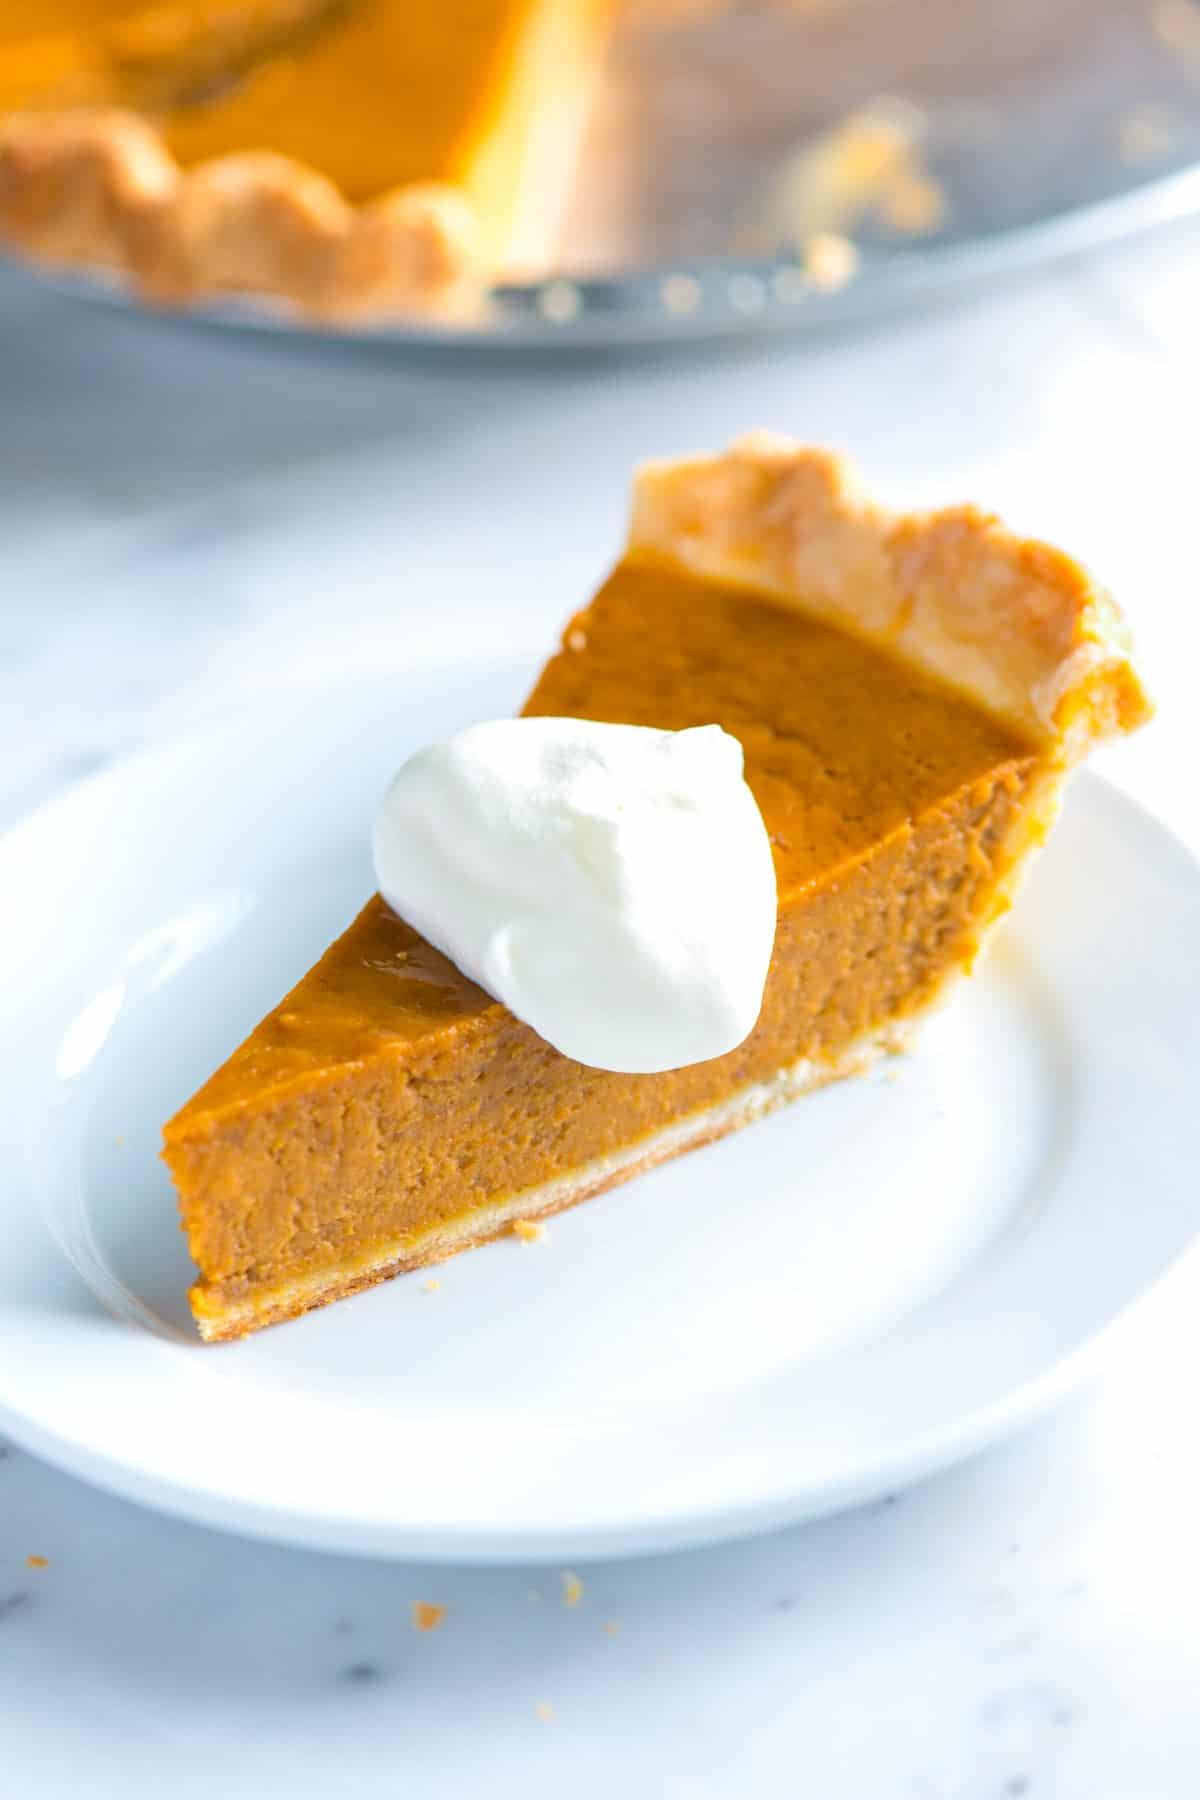 Pumpkin Pie Recipe With Real Pumpkin  easy real pumpkin pie